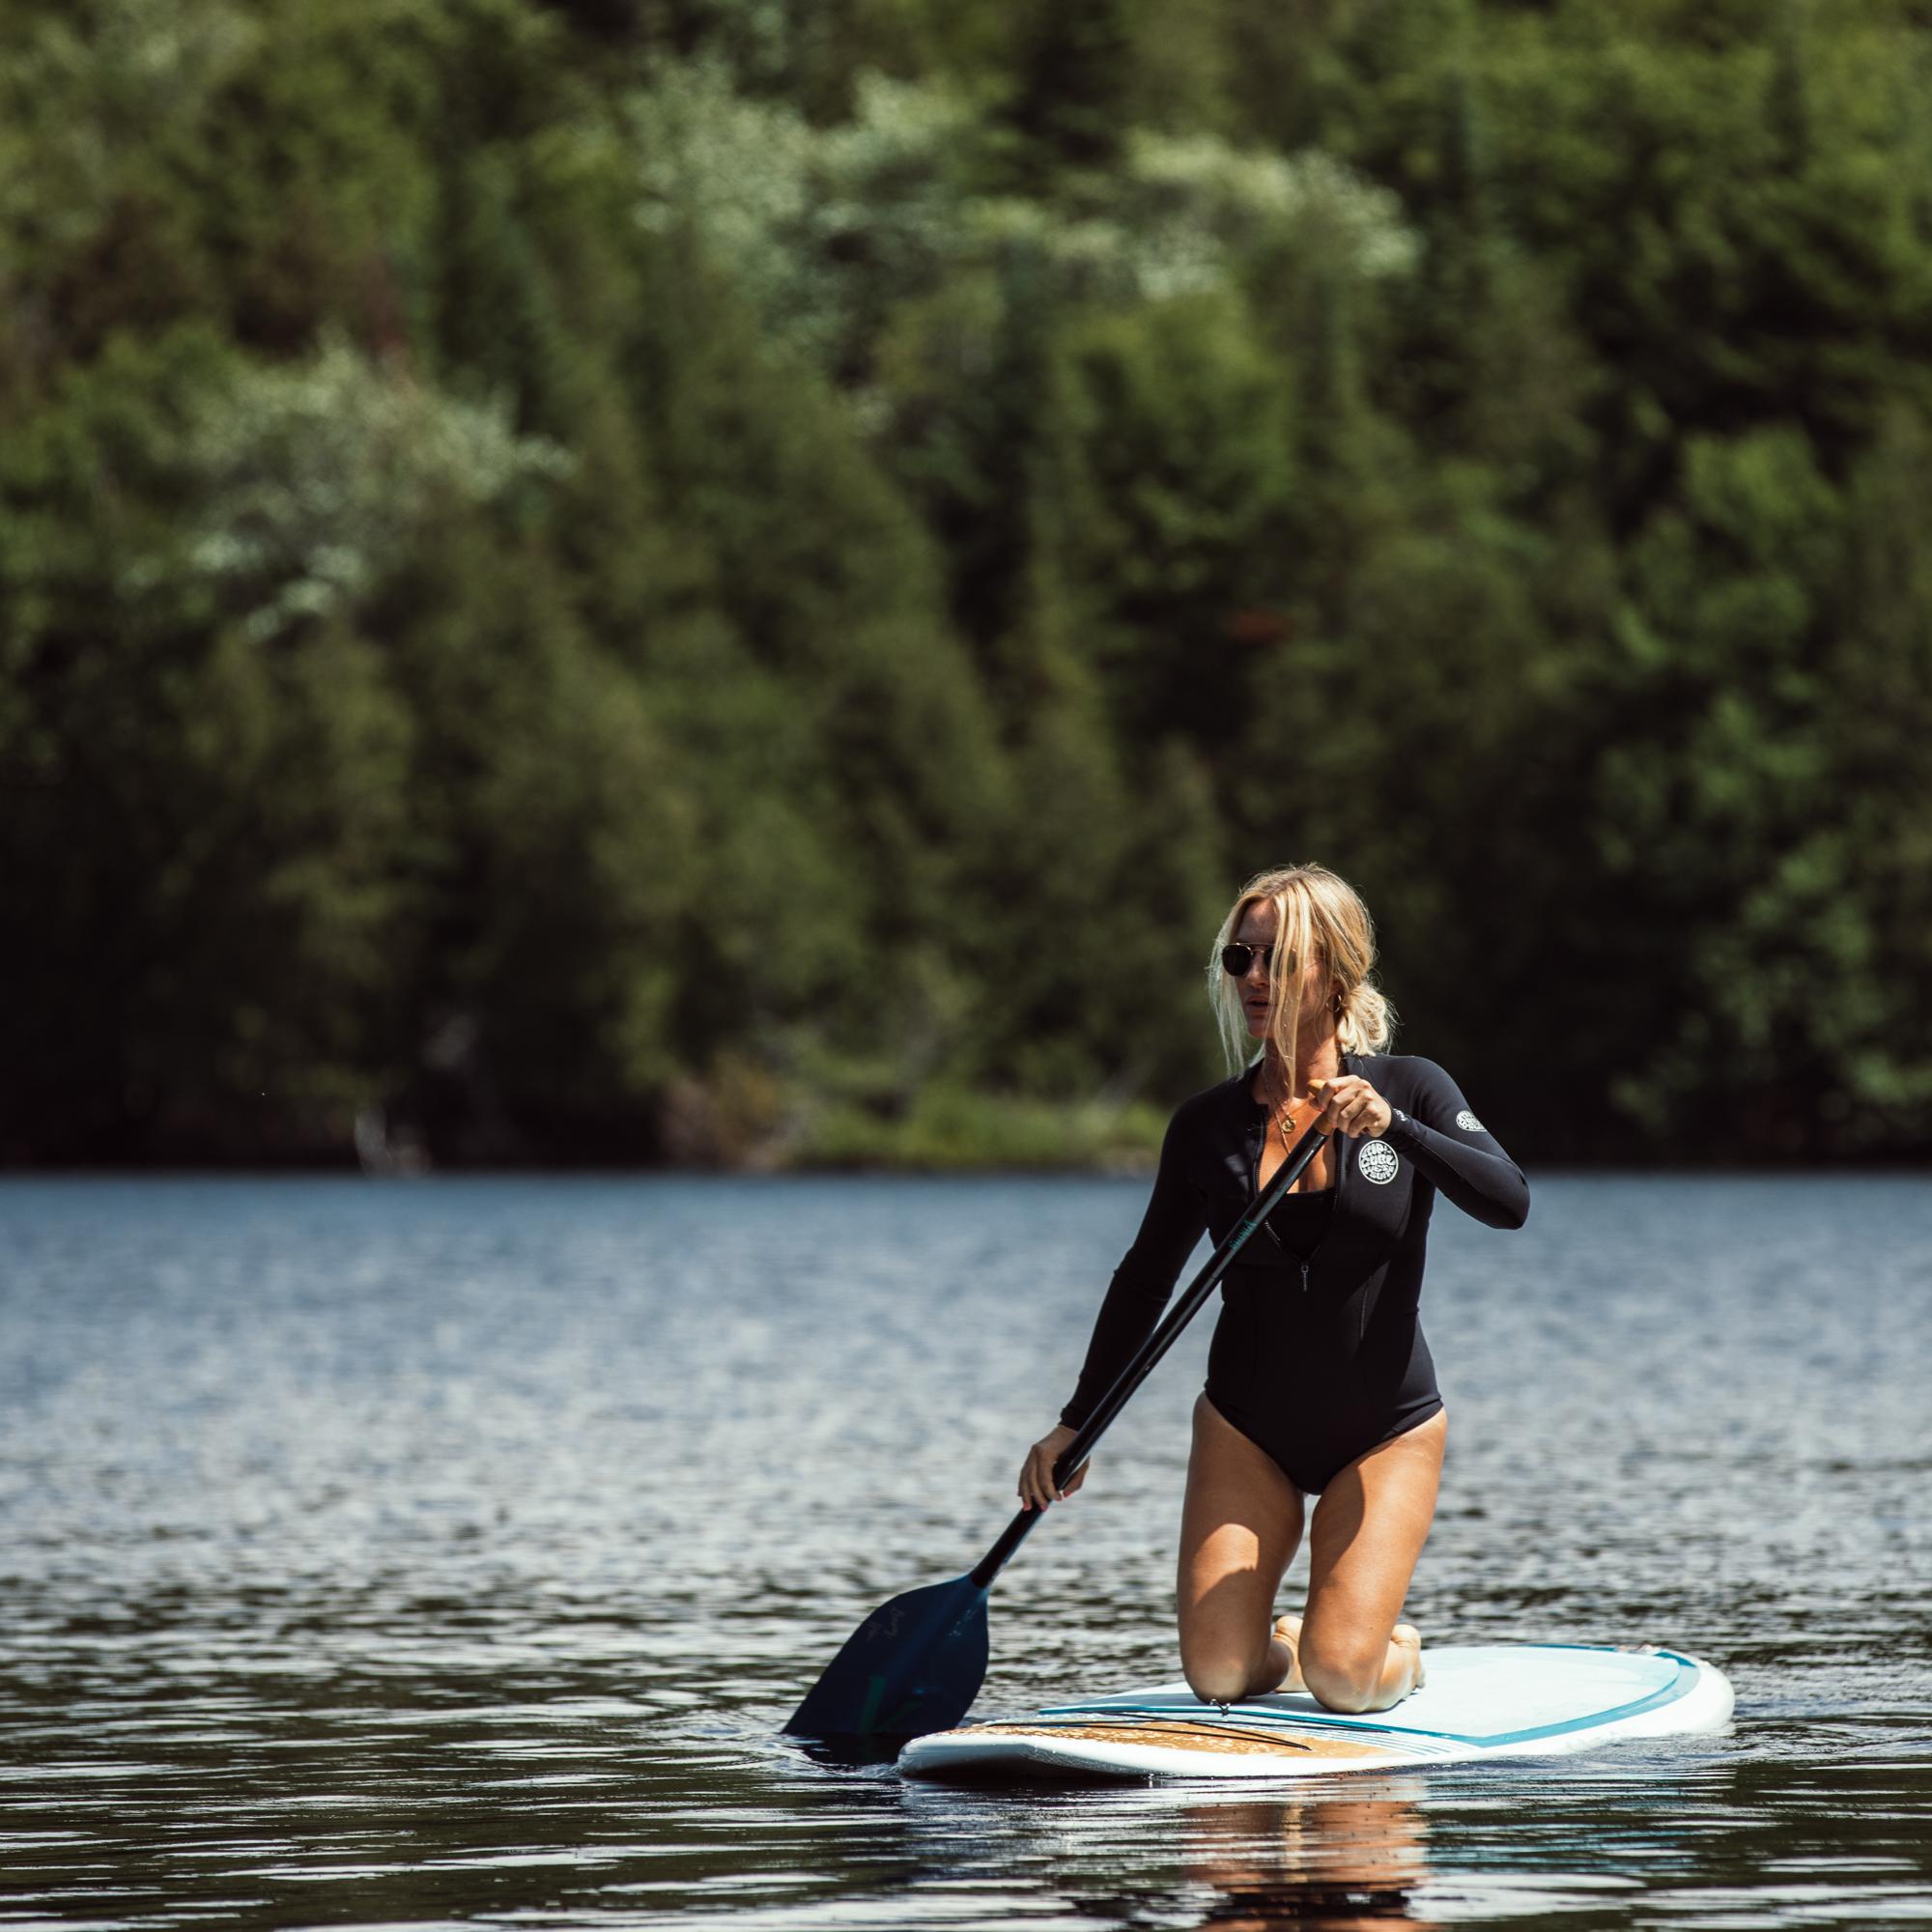 paddle board 2.jpg